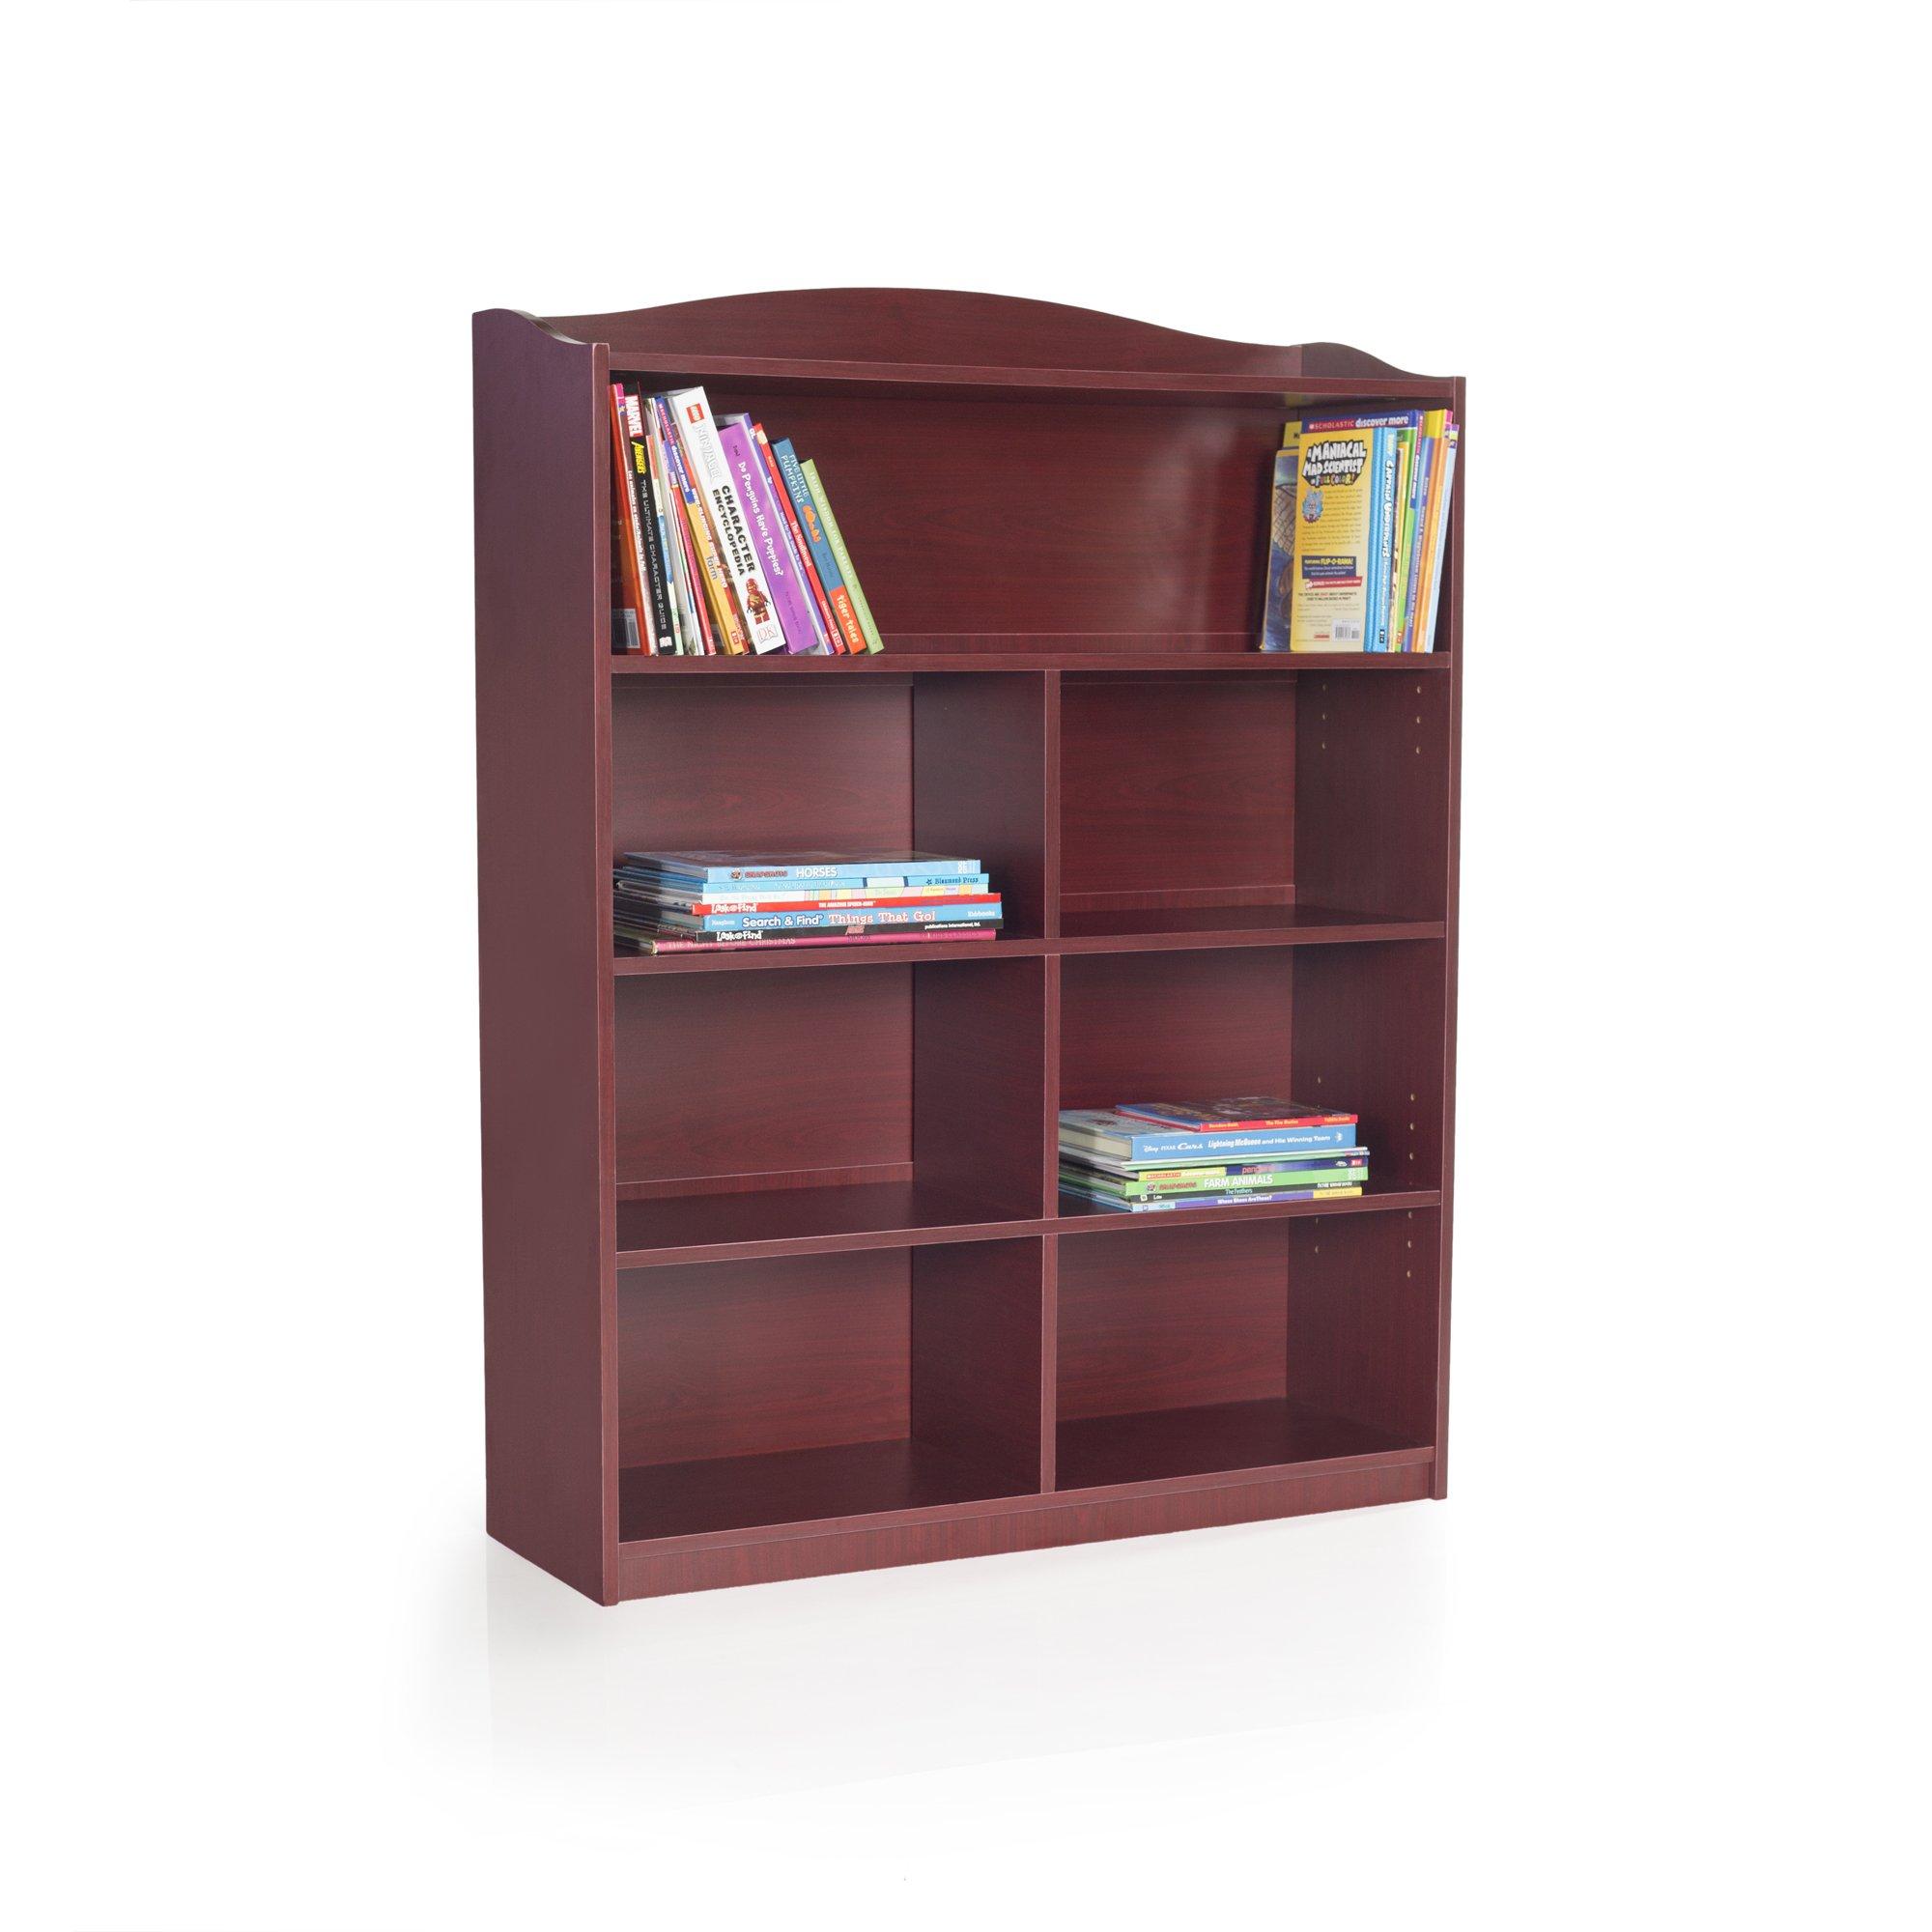 Guidecraft 7-Shelf Cherry Bookcase - Adjustable Shelves, Home & Office Organizer Furniture, Book Display